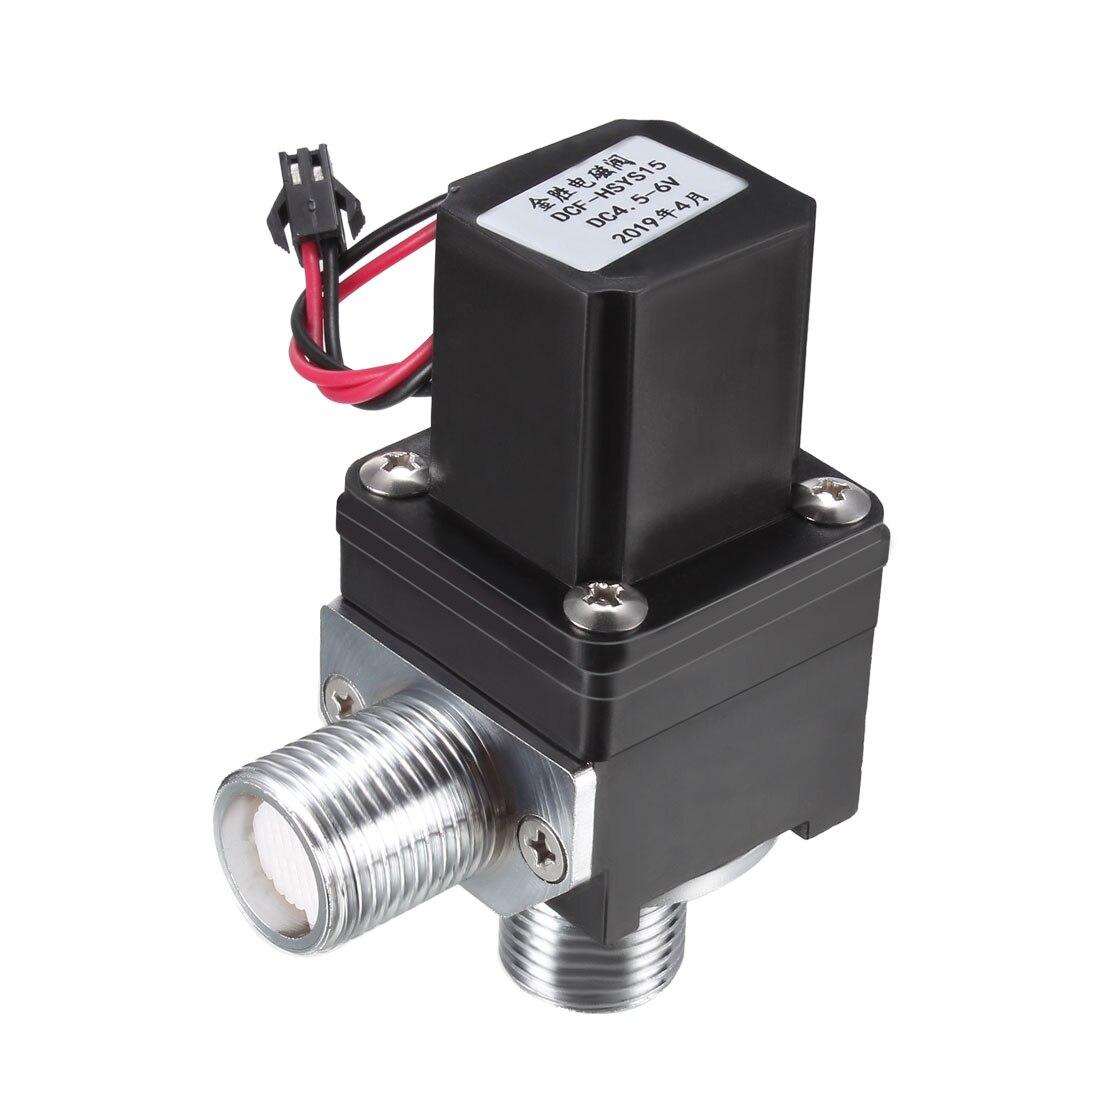 Uxcell Infrared Sensors Water Solenoid Valve G1/2